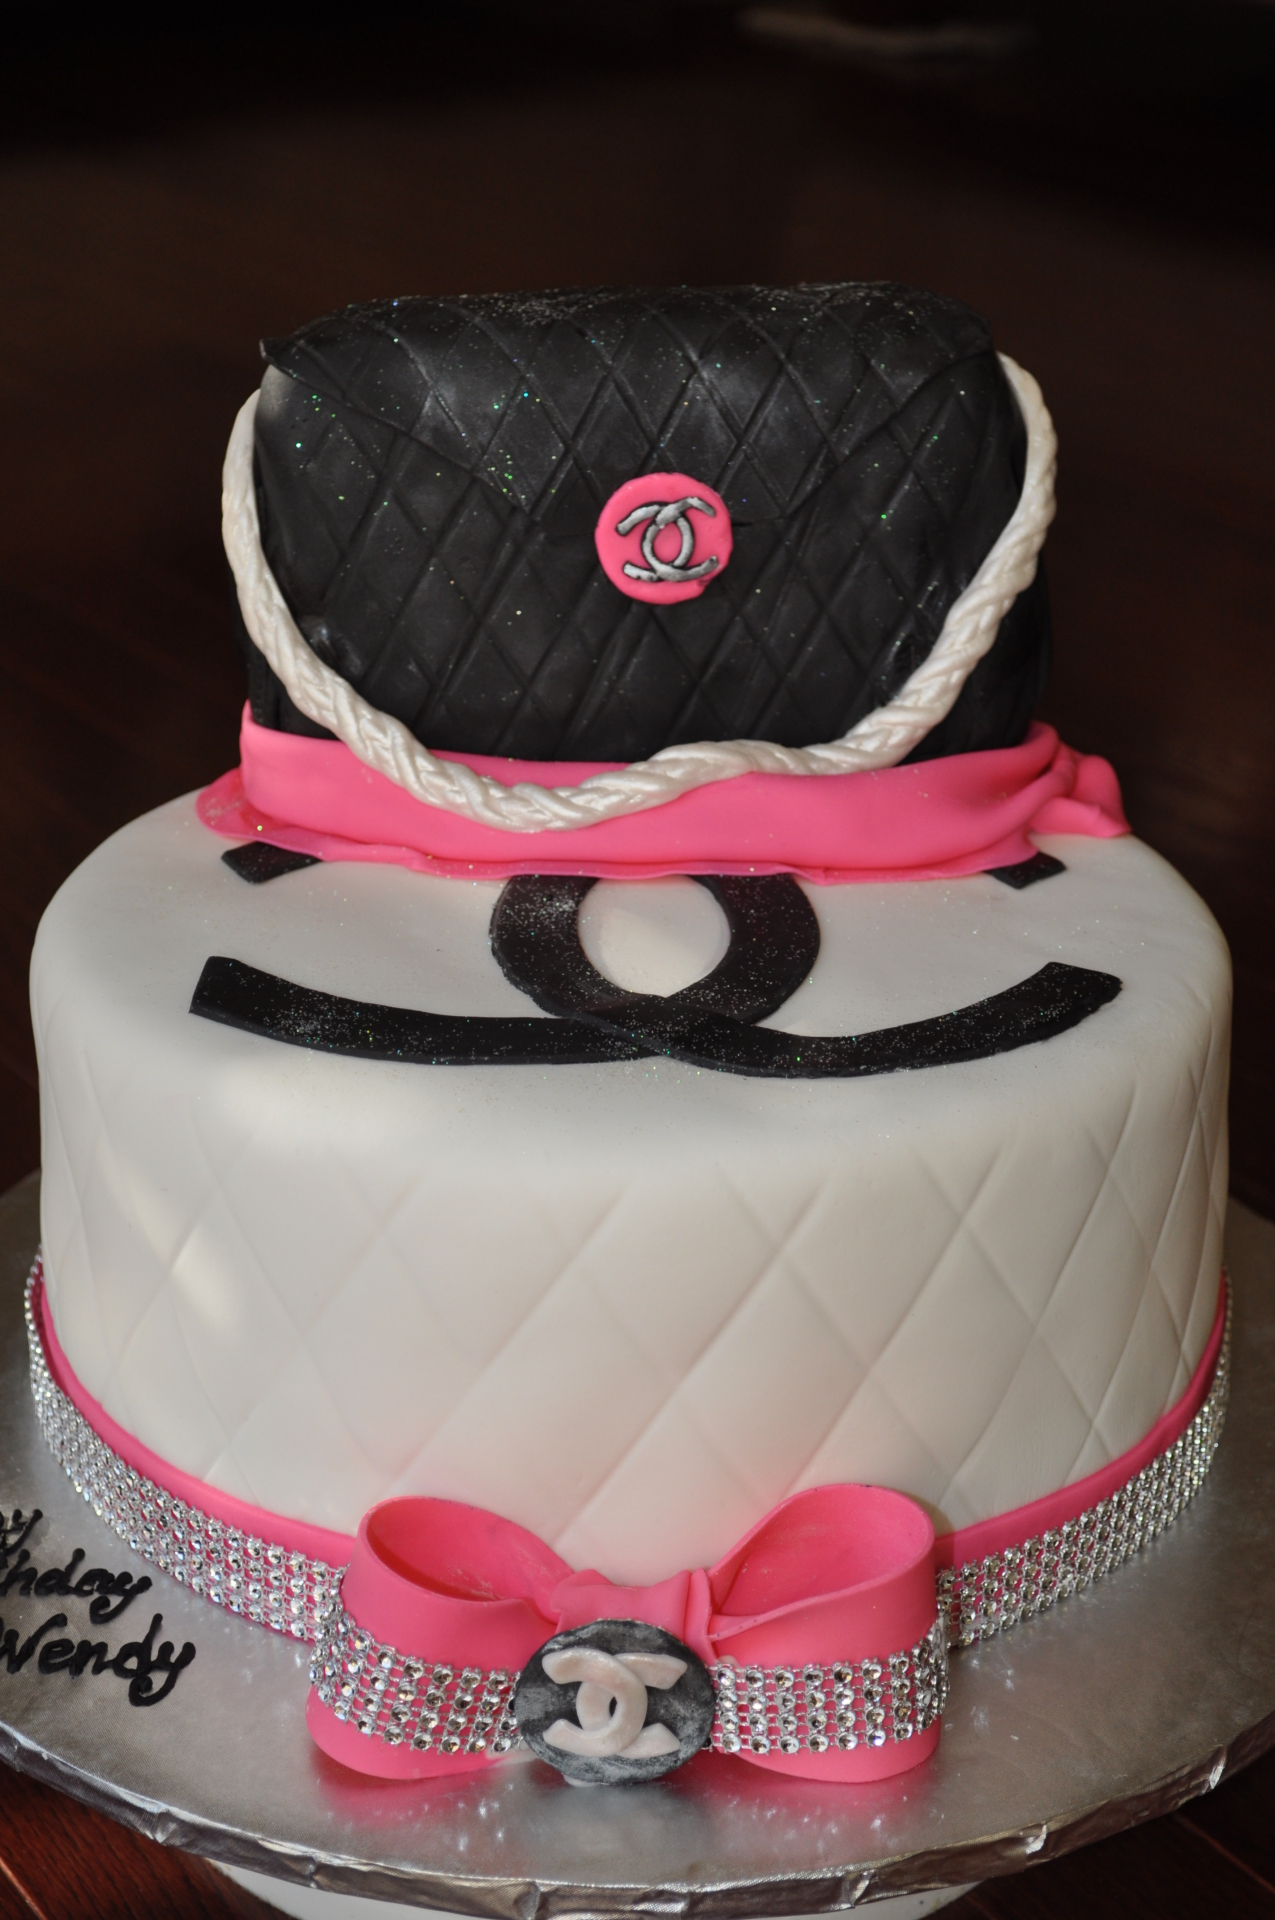 Chanel purse cake-3